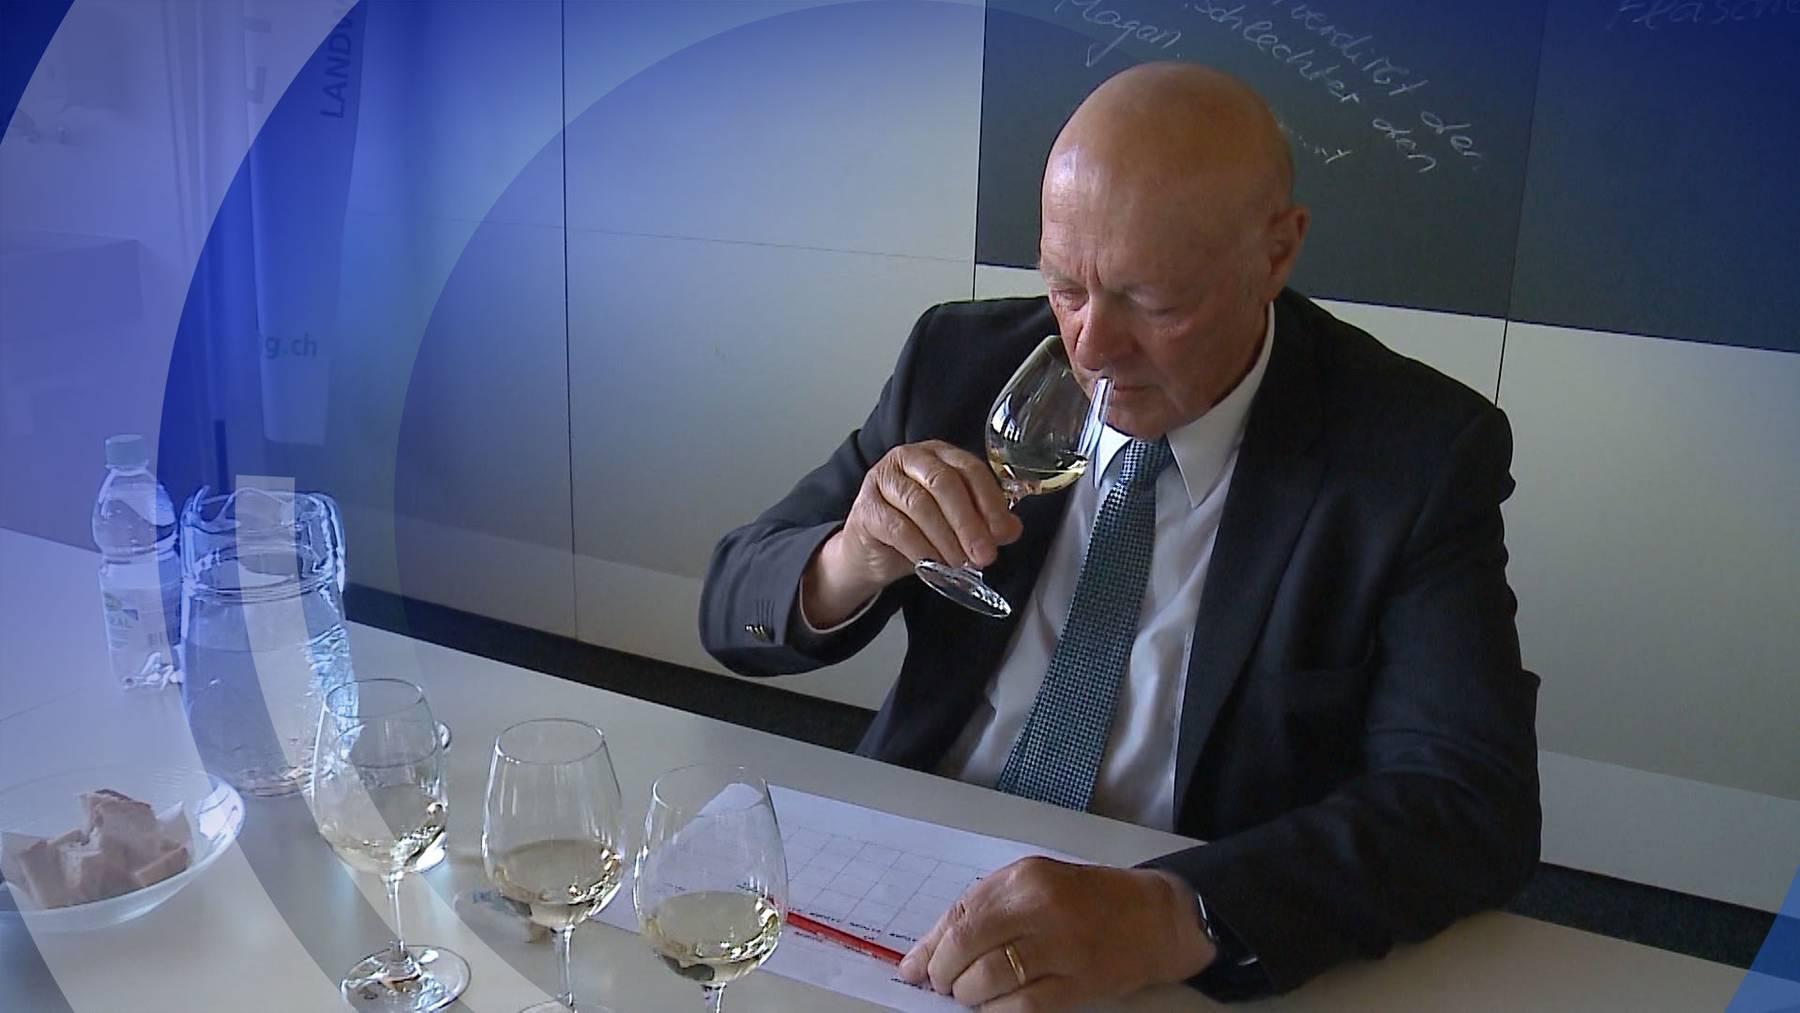 Aargauer Staatswein